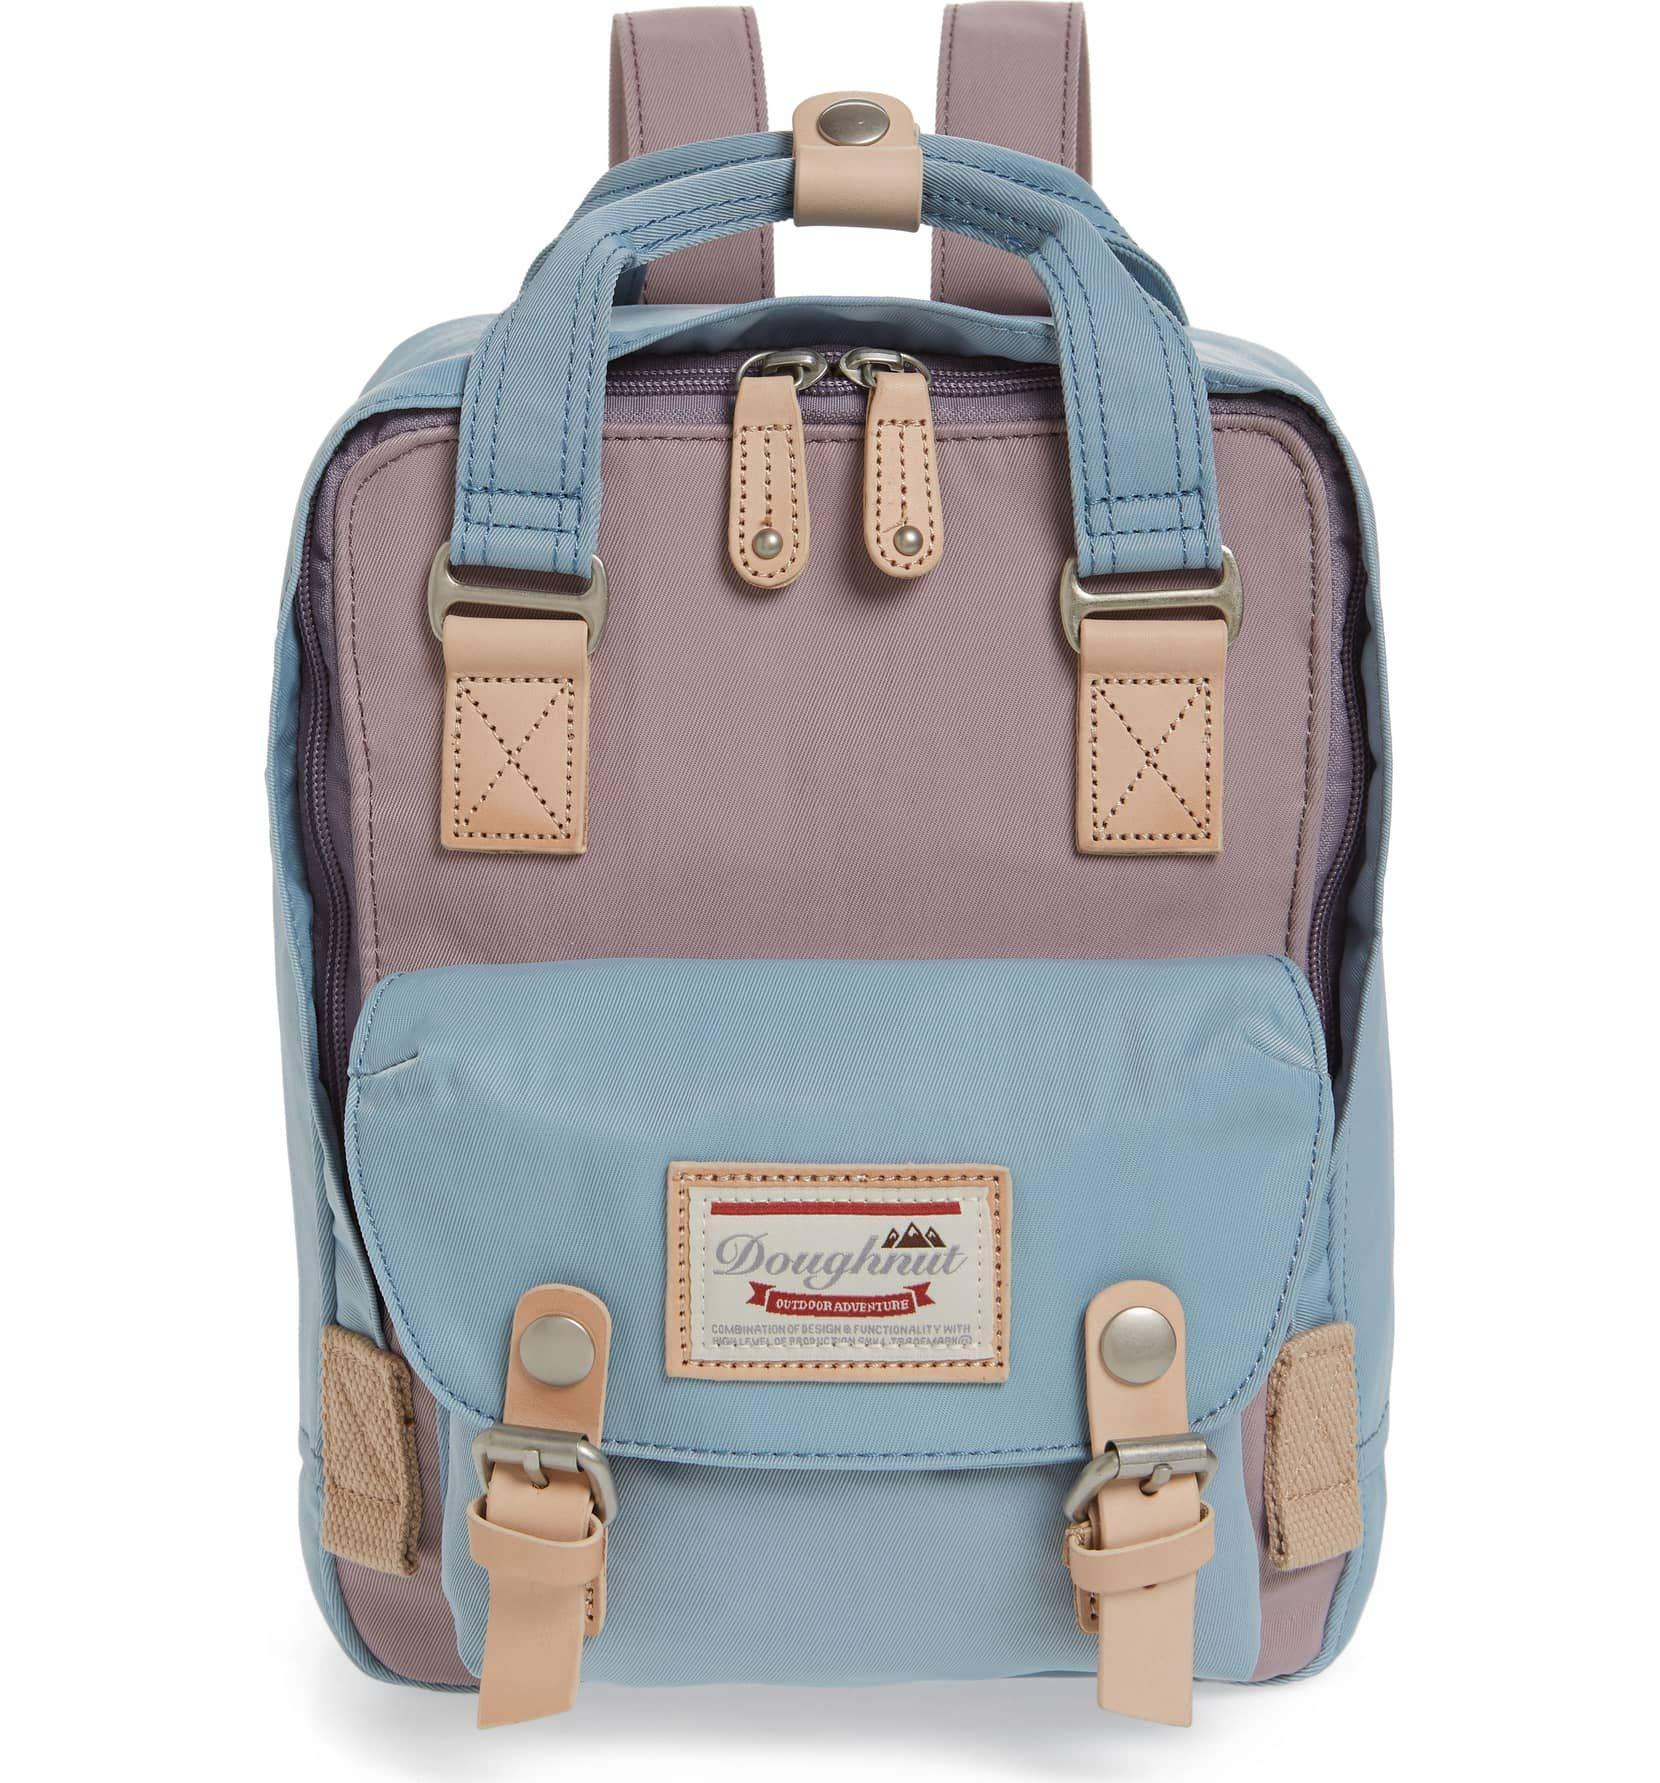 Doughnut Women's Mini Macaroon Backpack (One Size, Lilac/Light Blue)